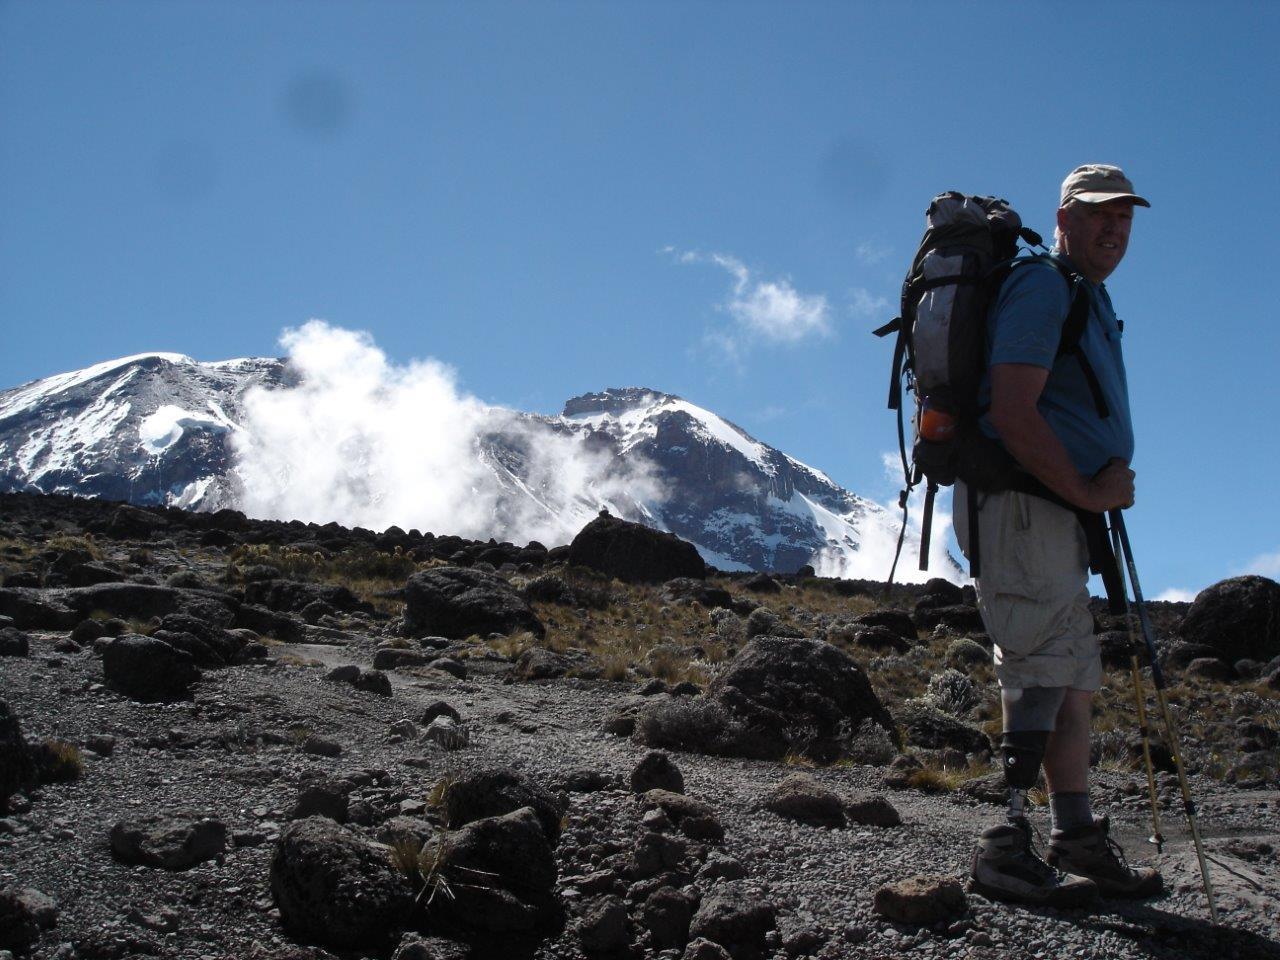 Amputee Climbs Kilimanjaro